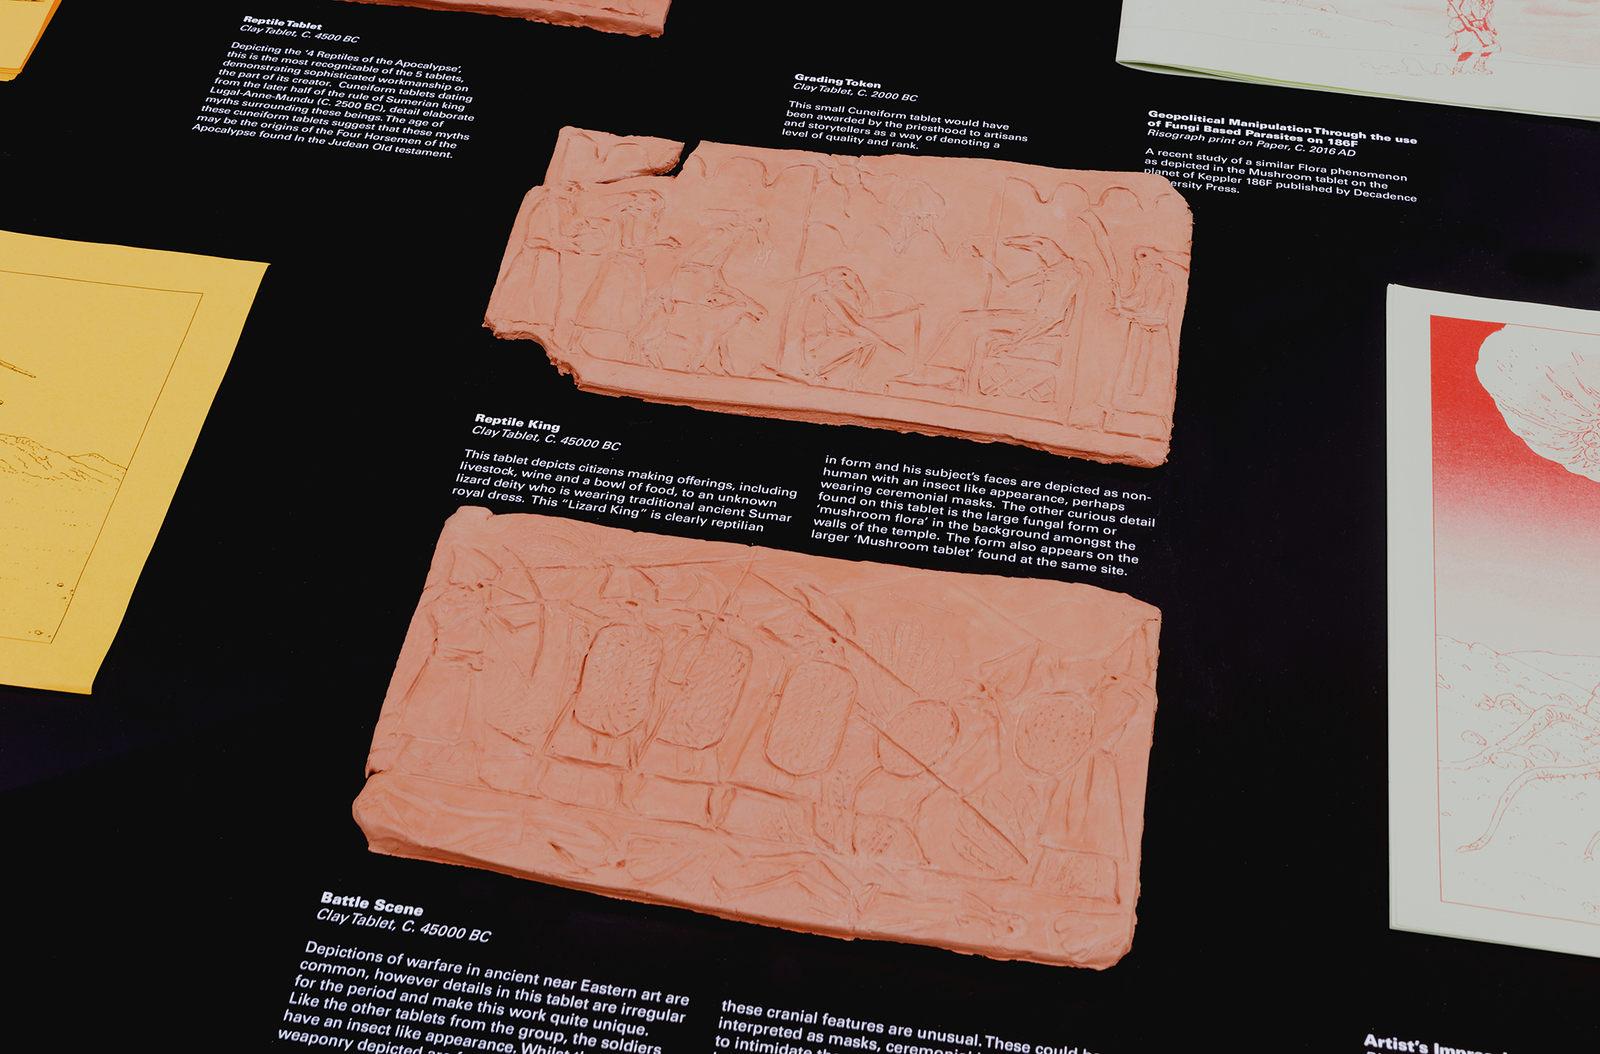 Lando - Archaeological Presentation by Decadence University Press - Reptile Tablet and the Mushroom Mythos (2015)